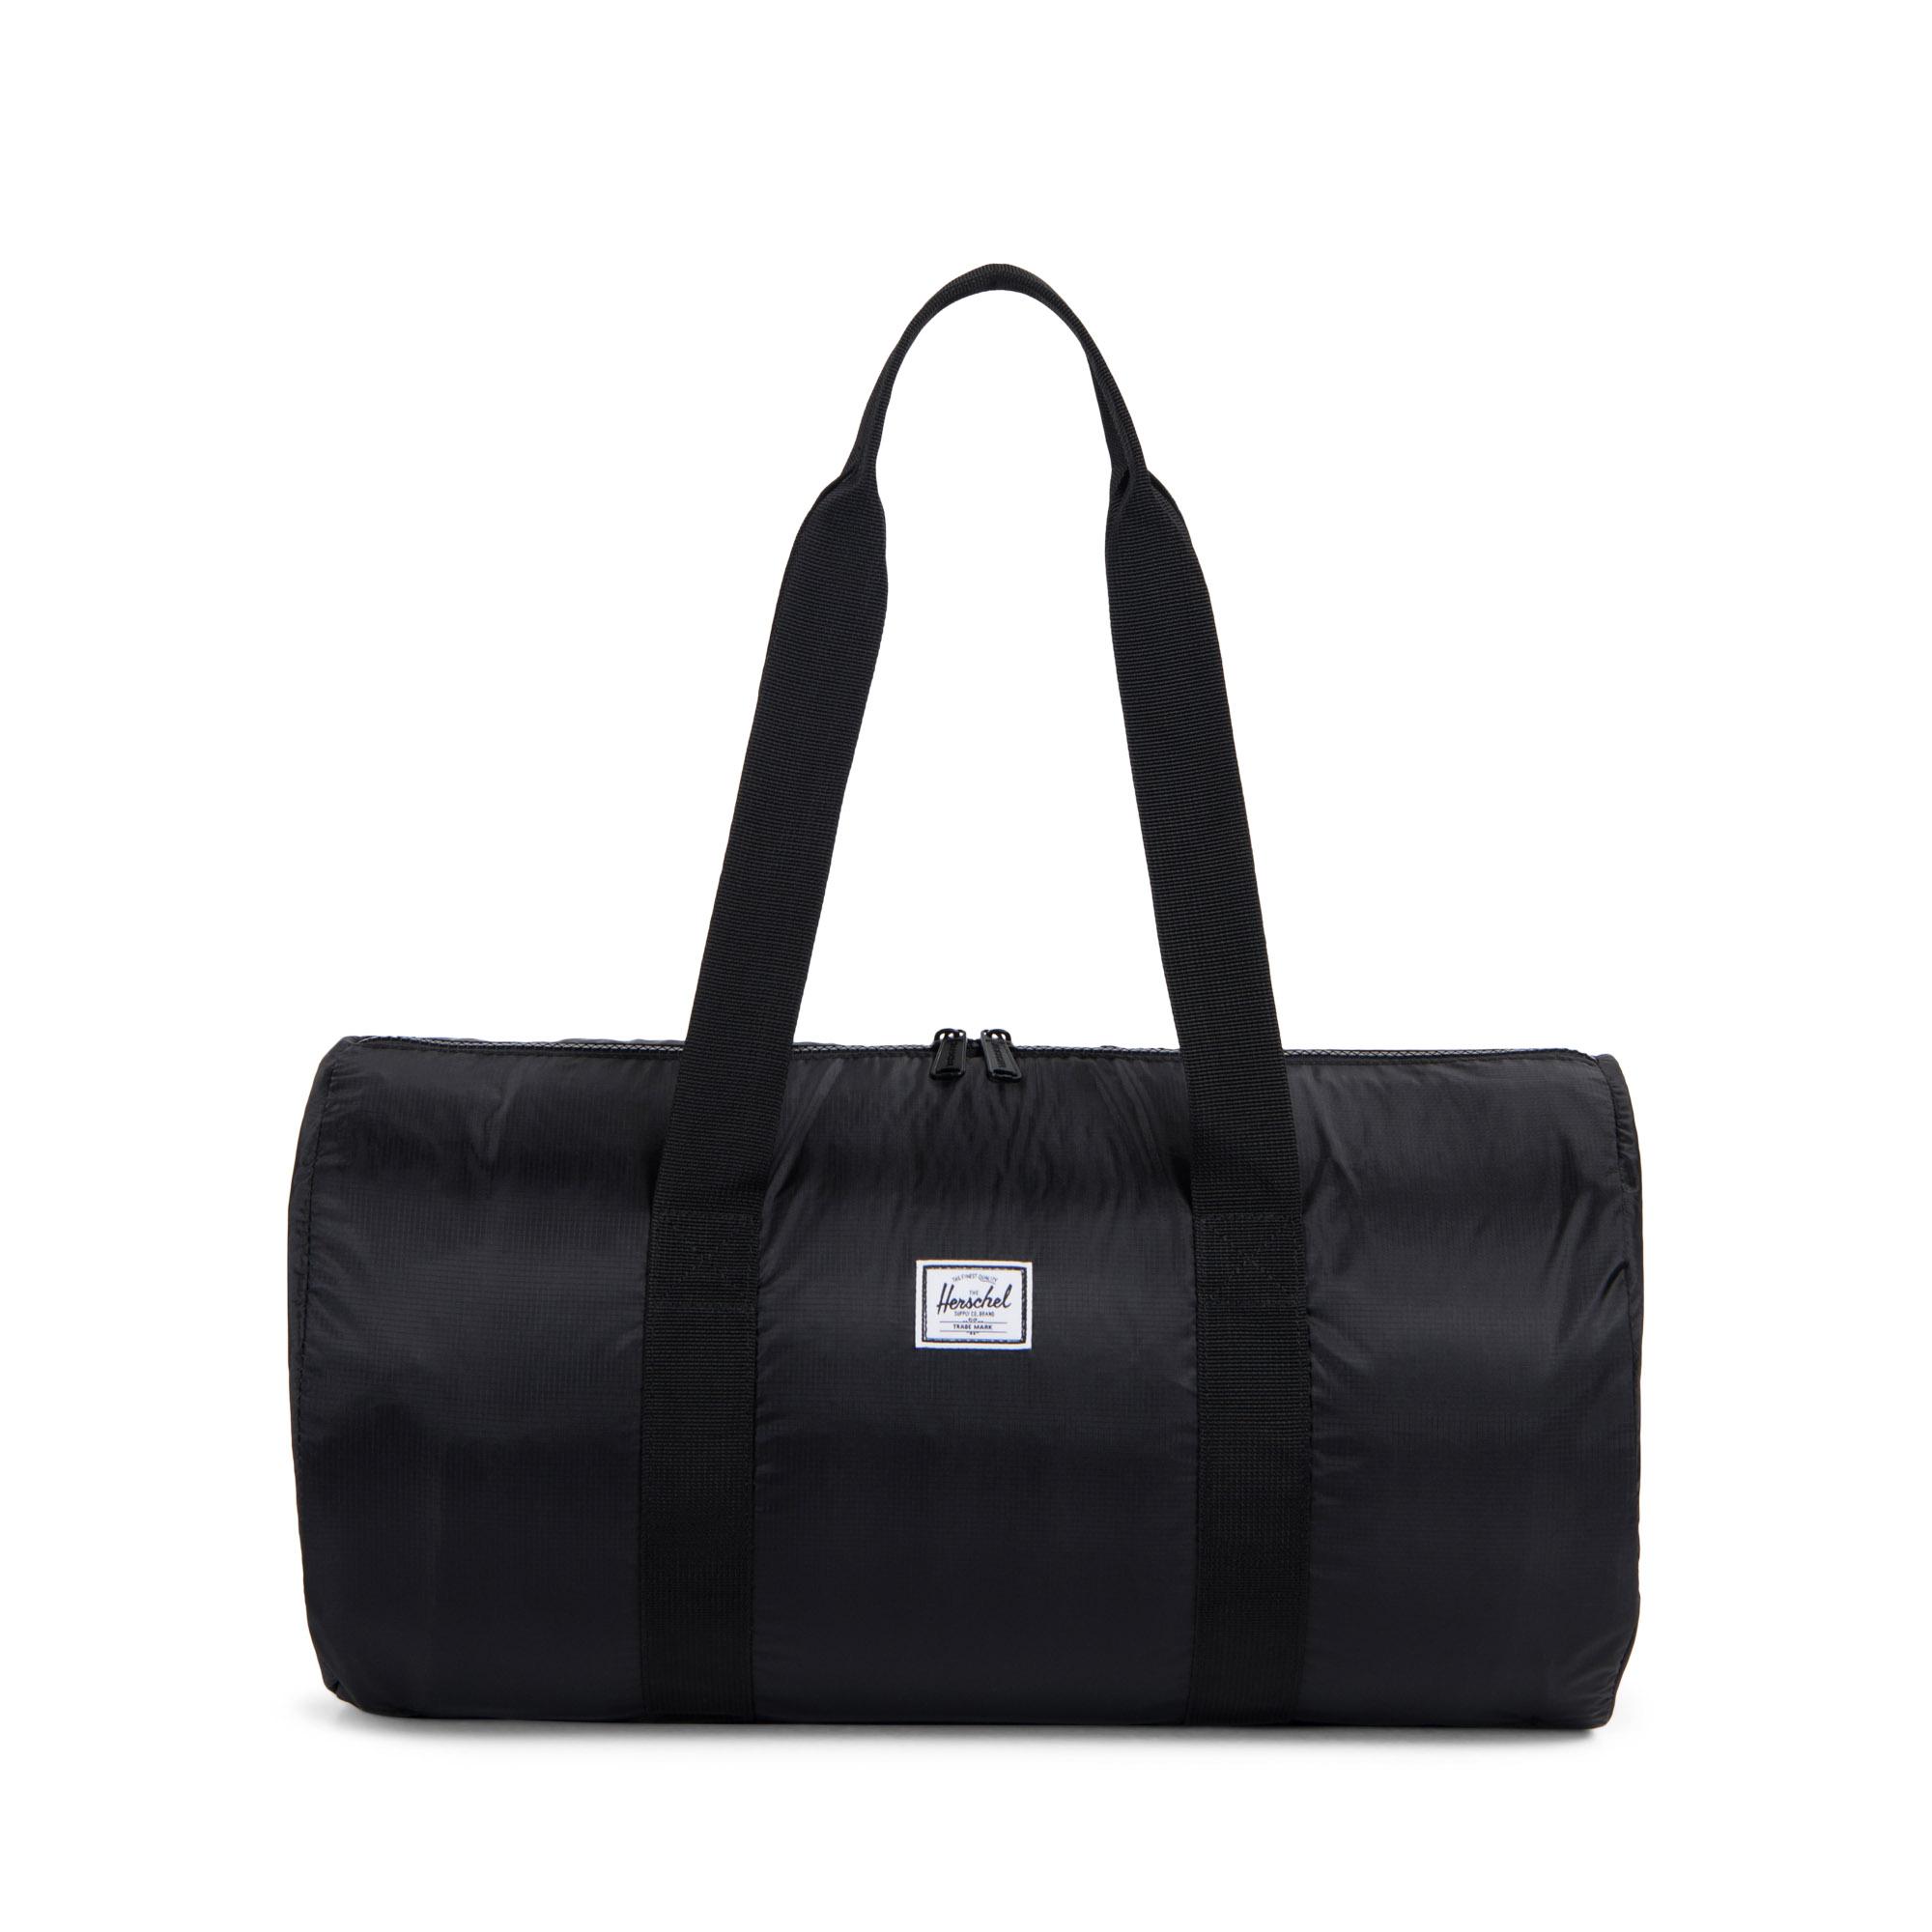 d36d69118a6d Packable Duffle